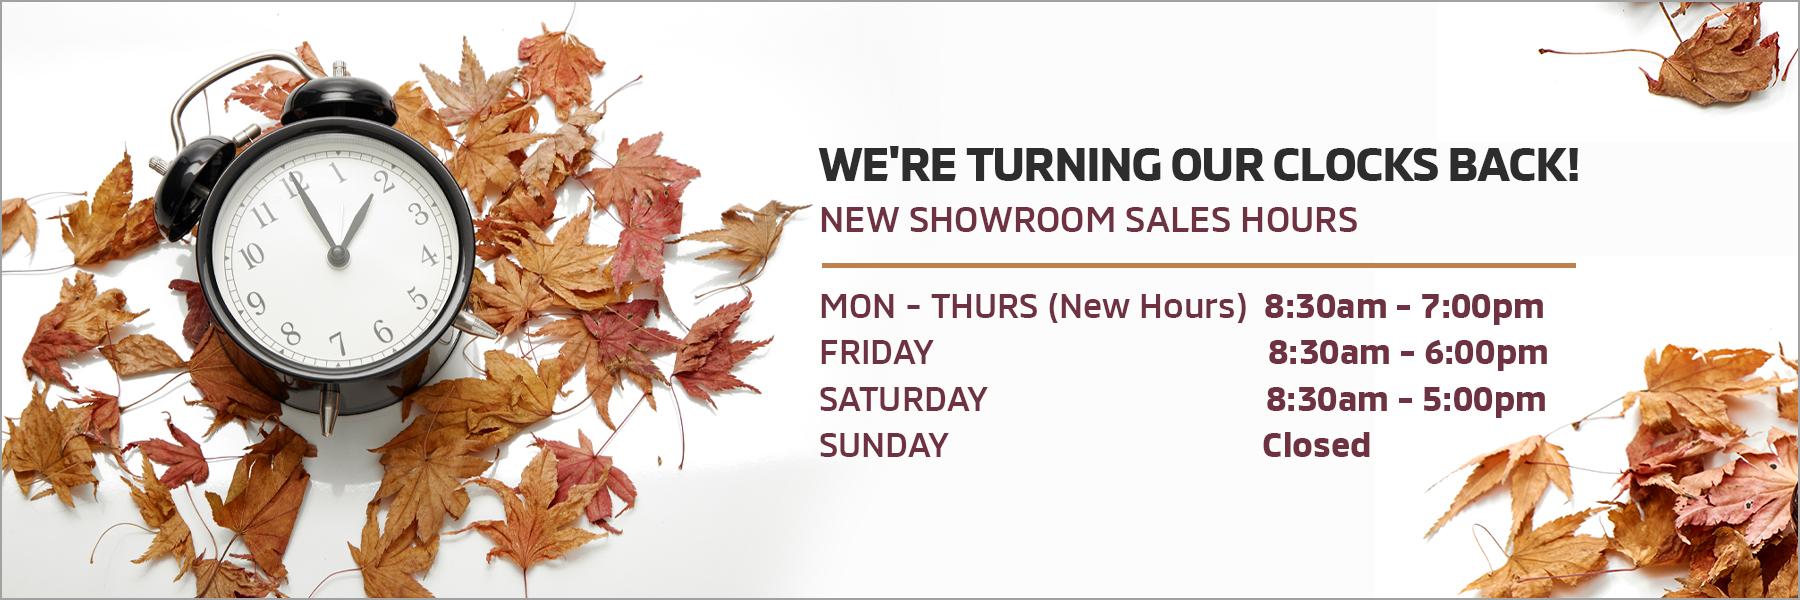 New Showroom Hours